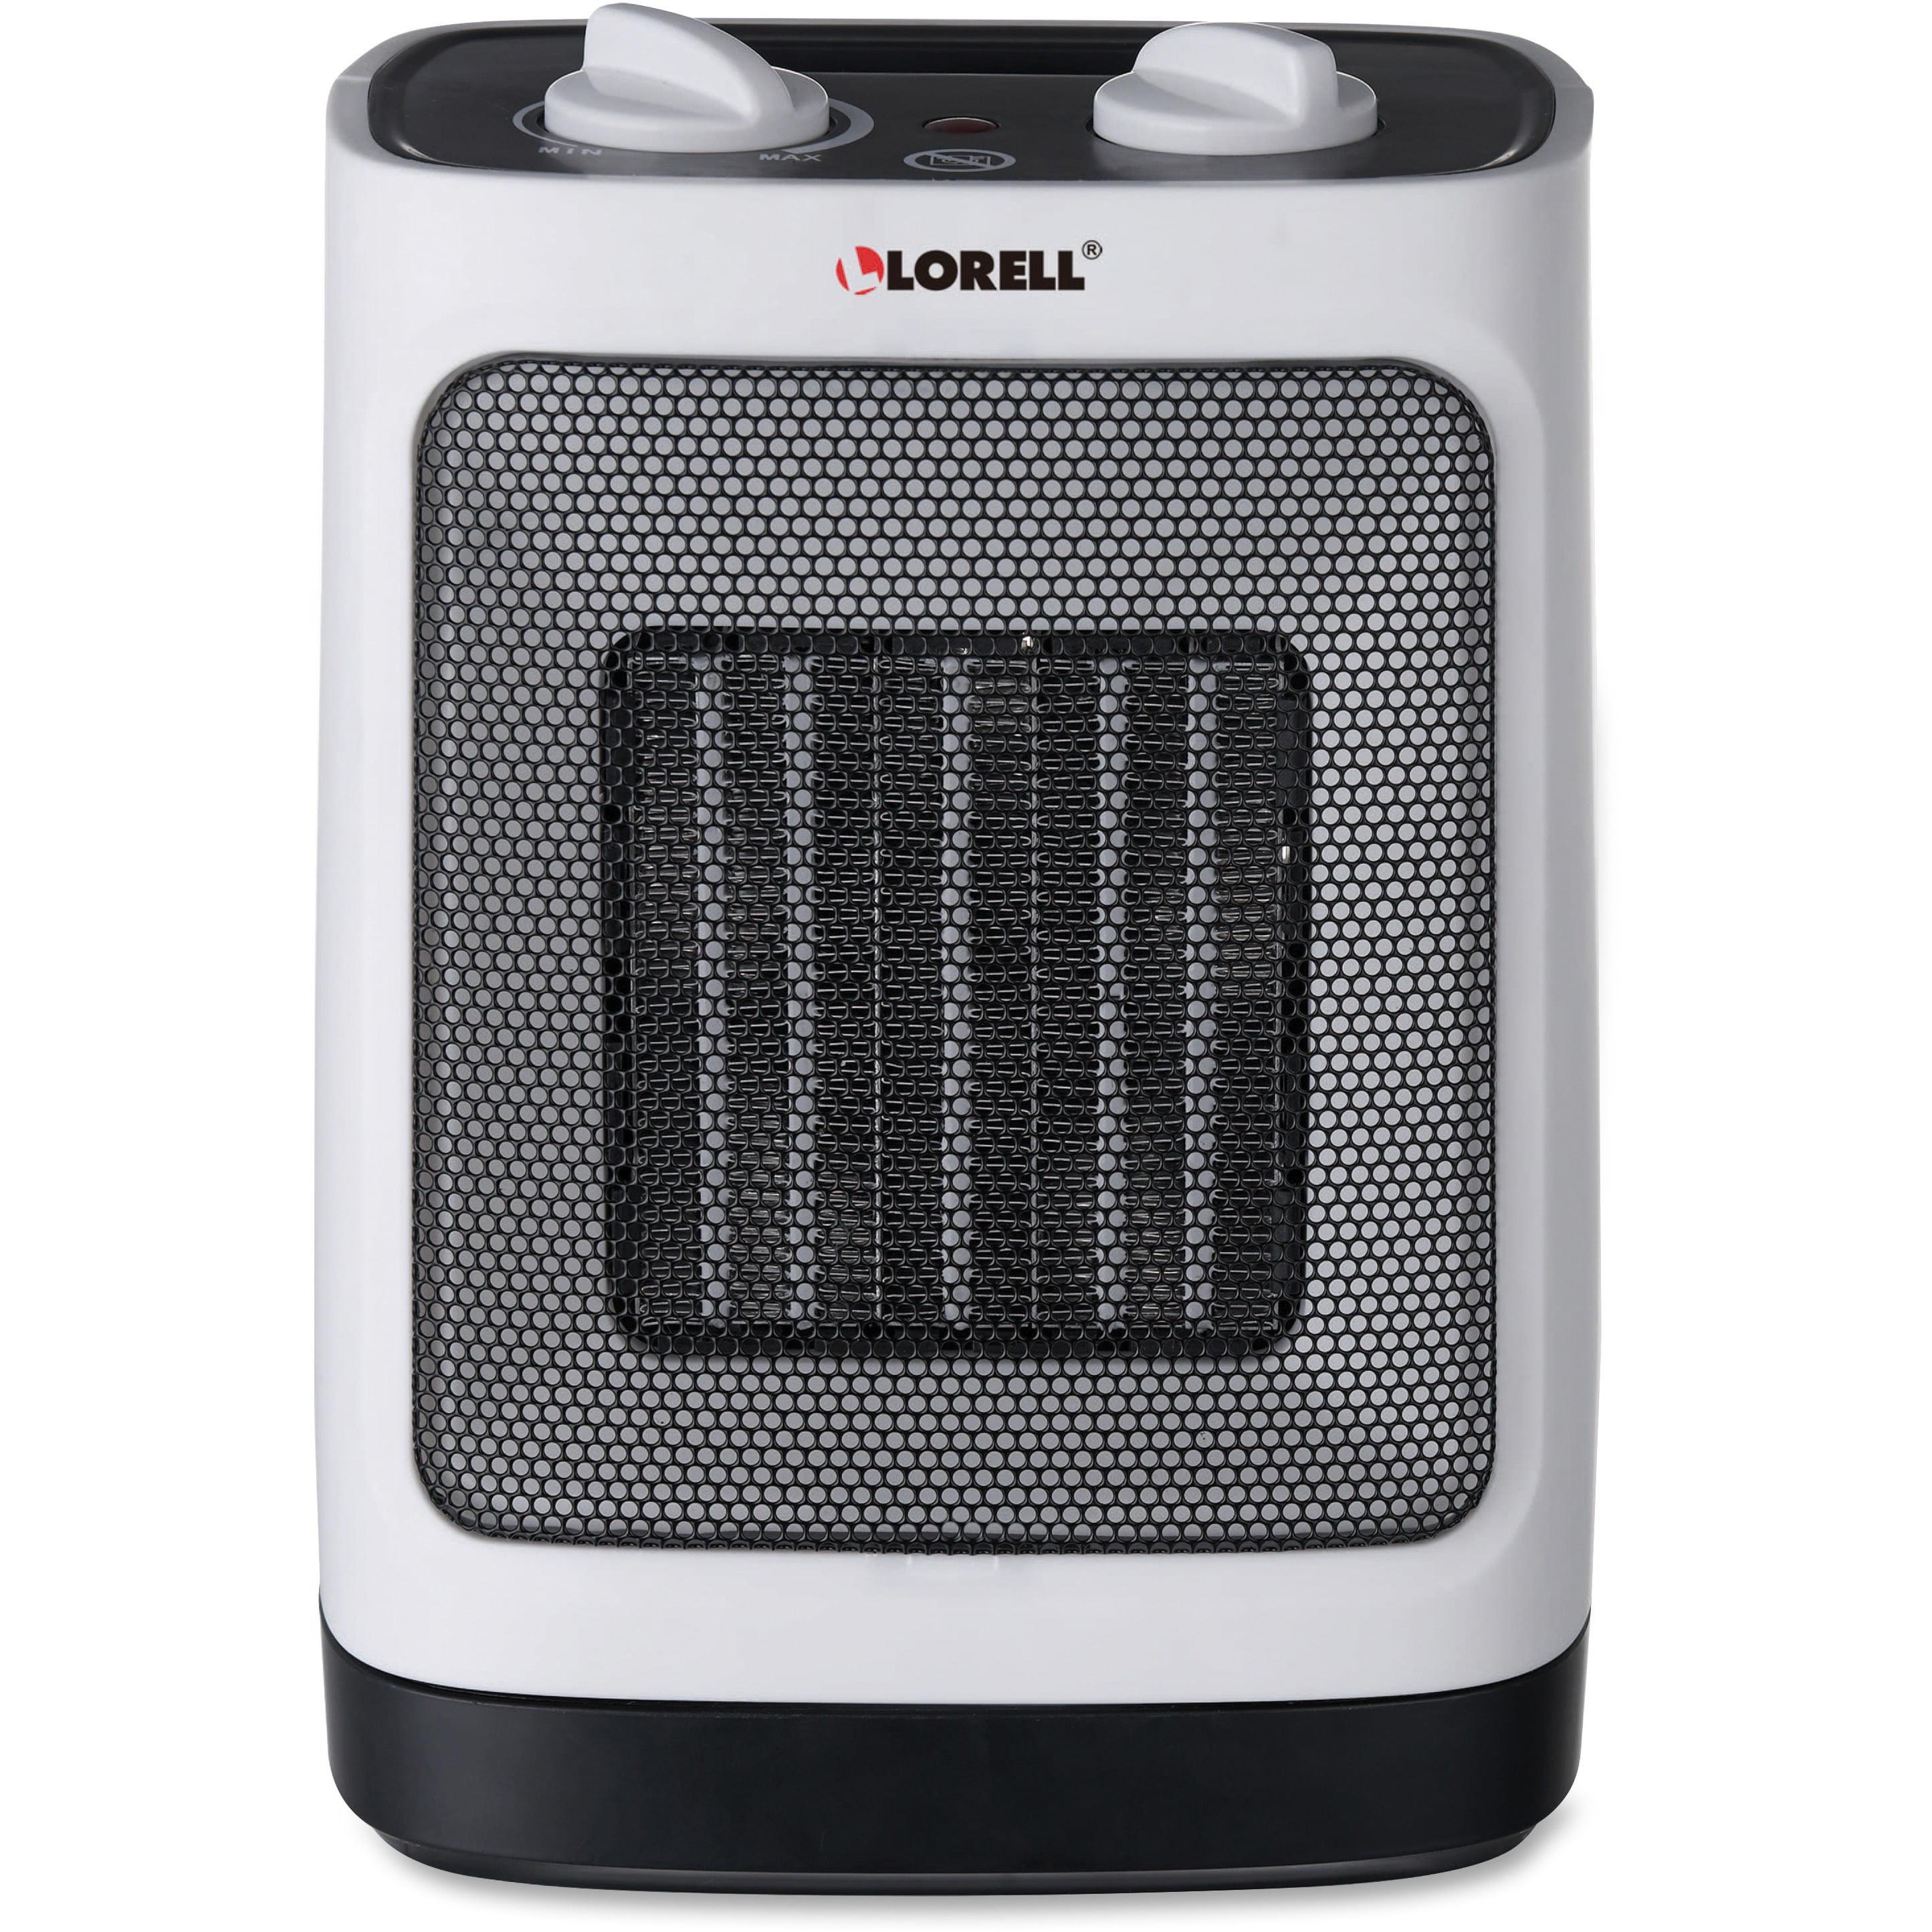 Lorell, LLR99841, Adjustable Ceramic Heater, White